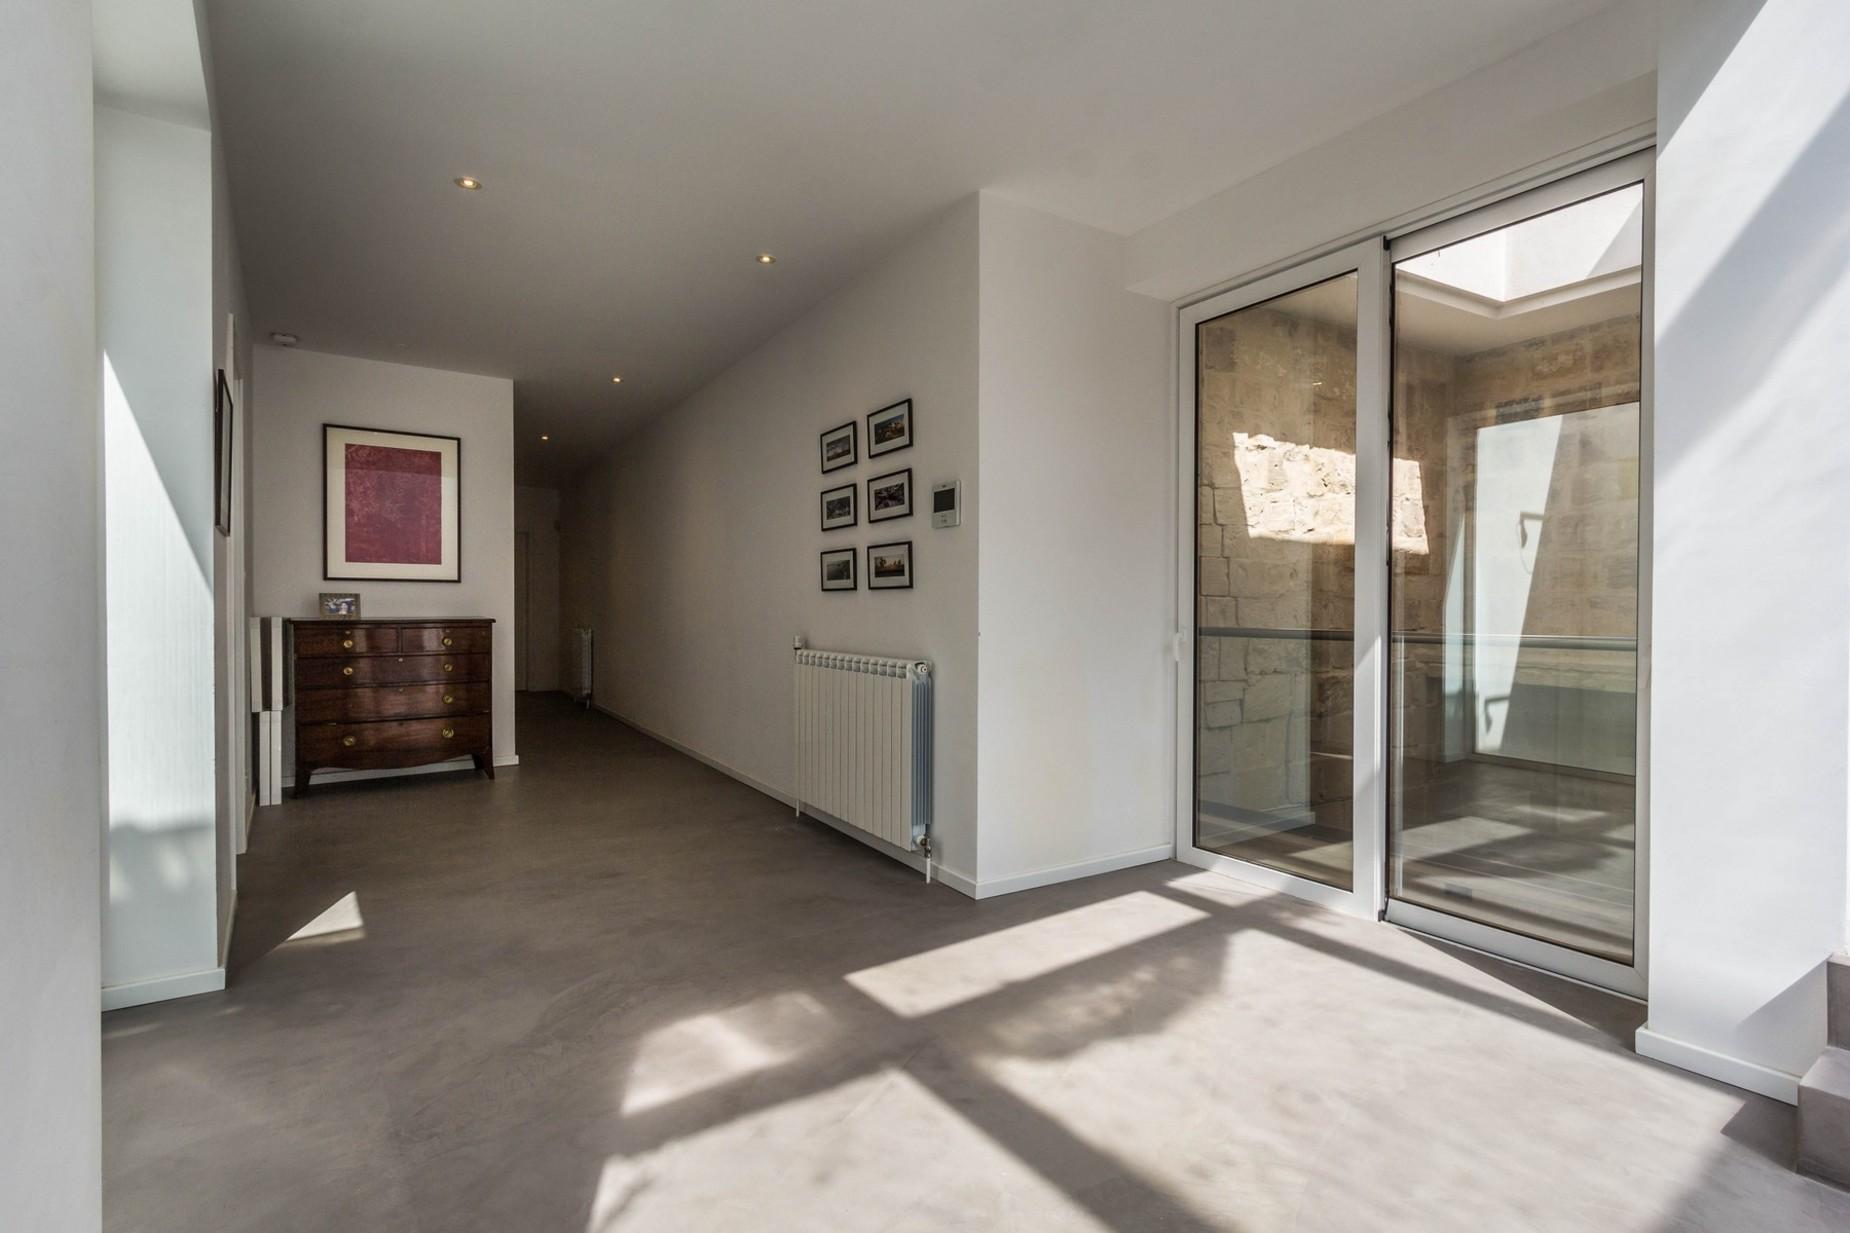 4 bed Villa For Sale in Gharghur, Gharghur - thumb 23